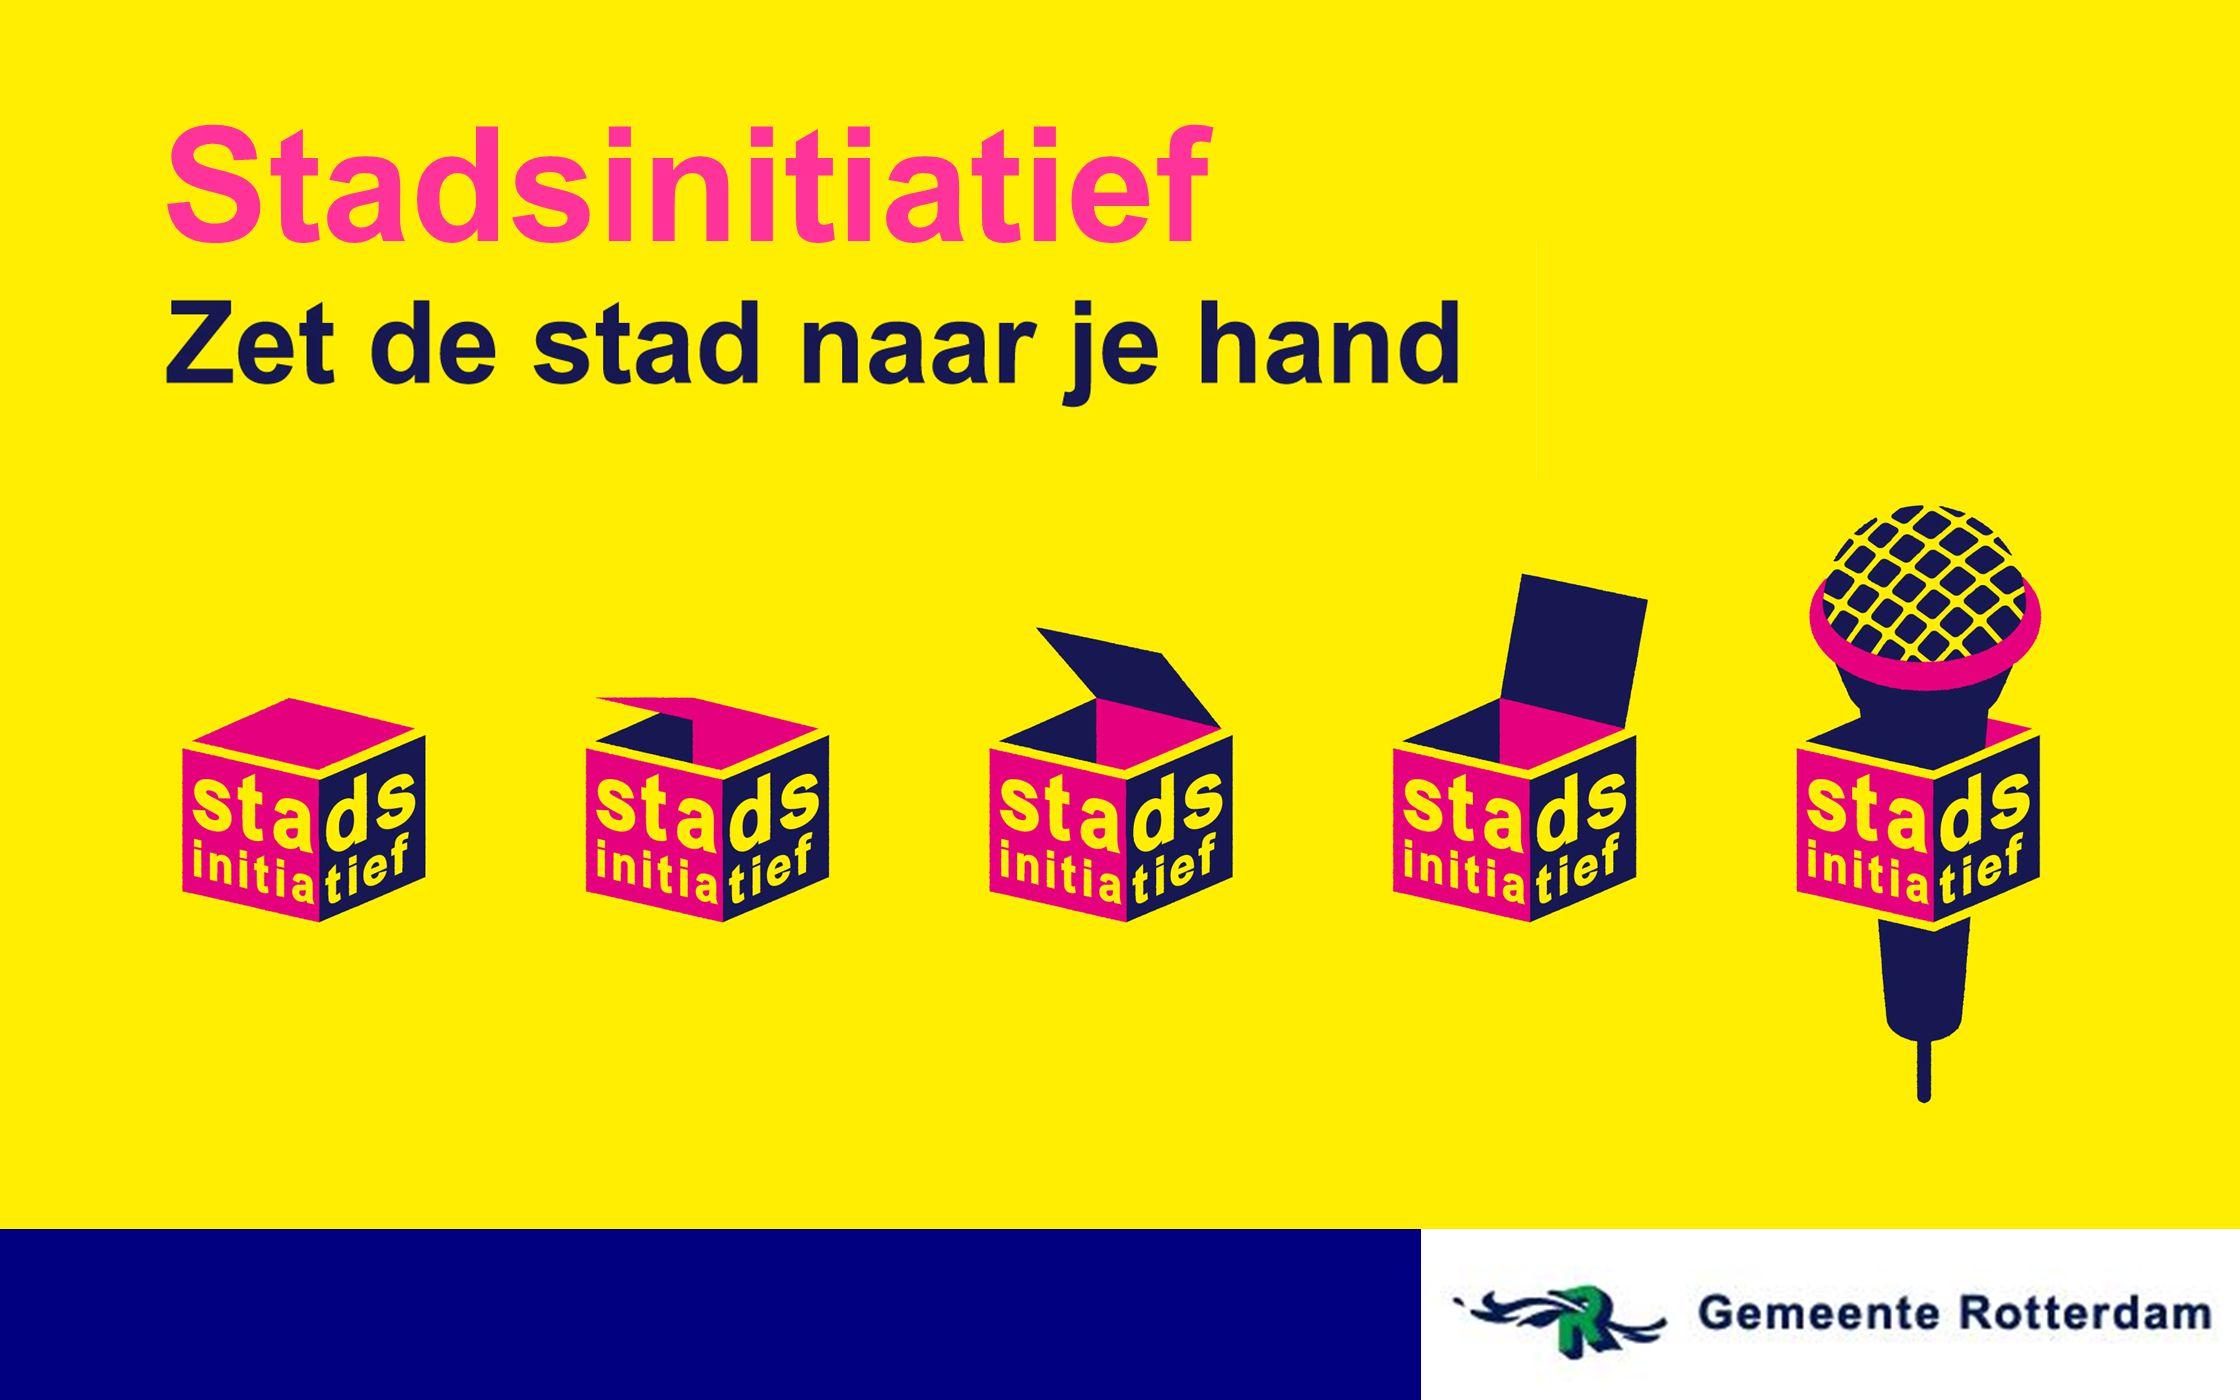 Rotterdam Stadsinitiatief